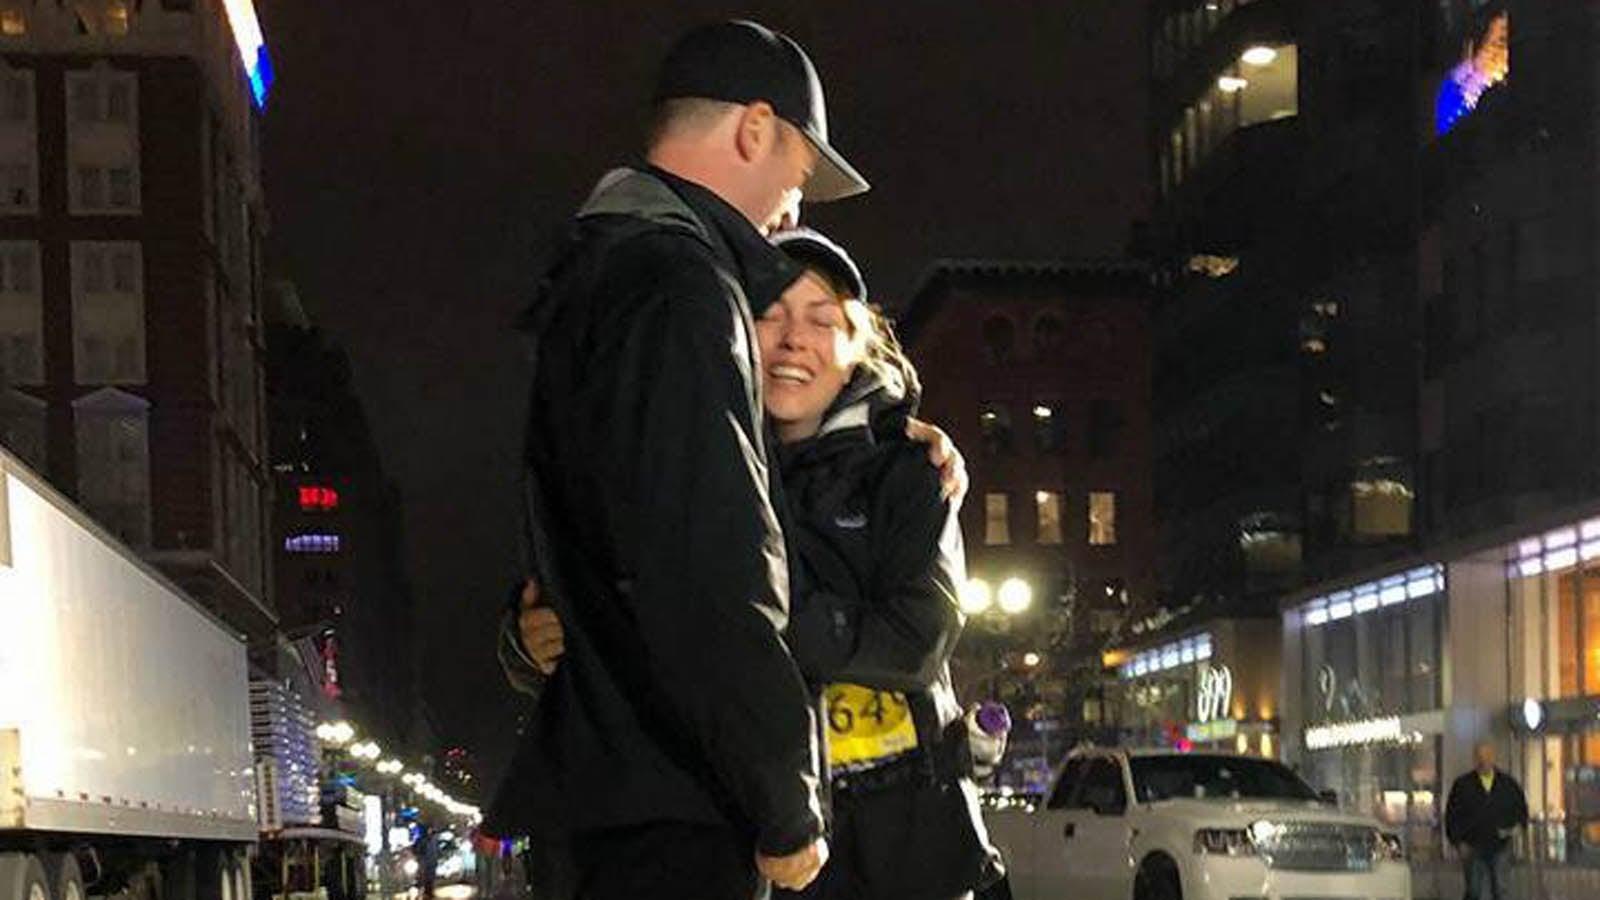 Mary Shertenlieb Completes Boston Maraton